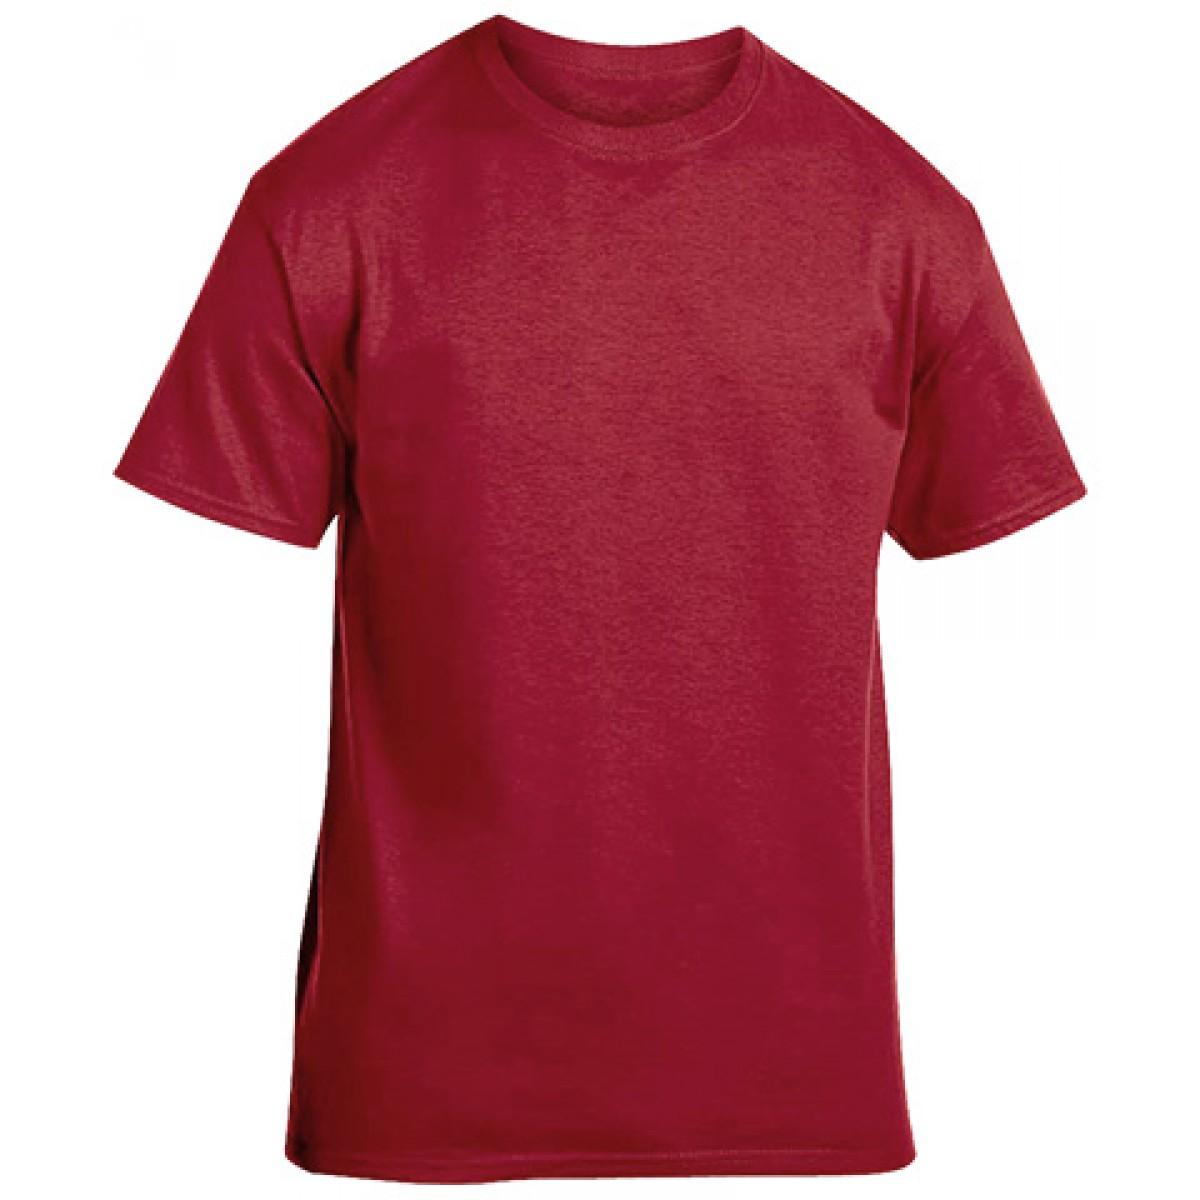 Gildan Cotton Short Sleeve T-Shirt - Cardinal Red